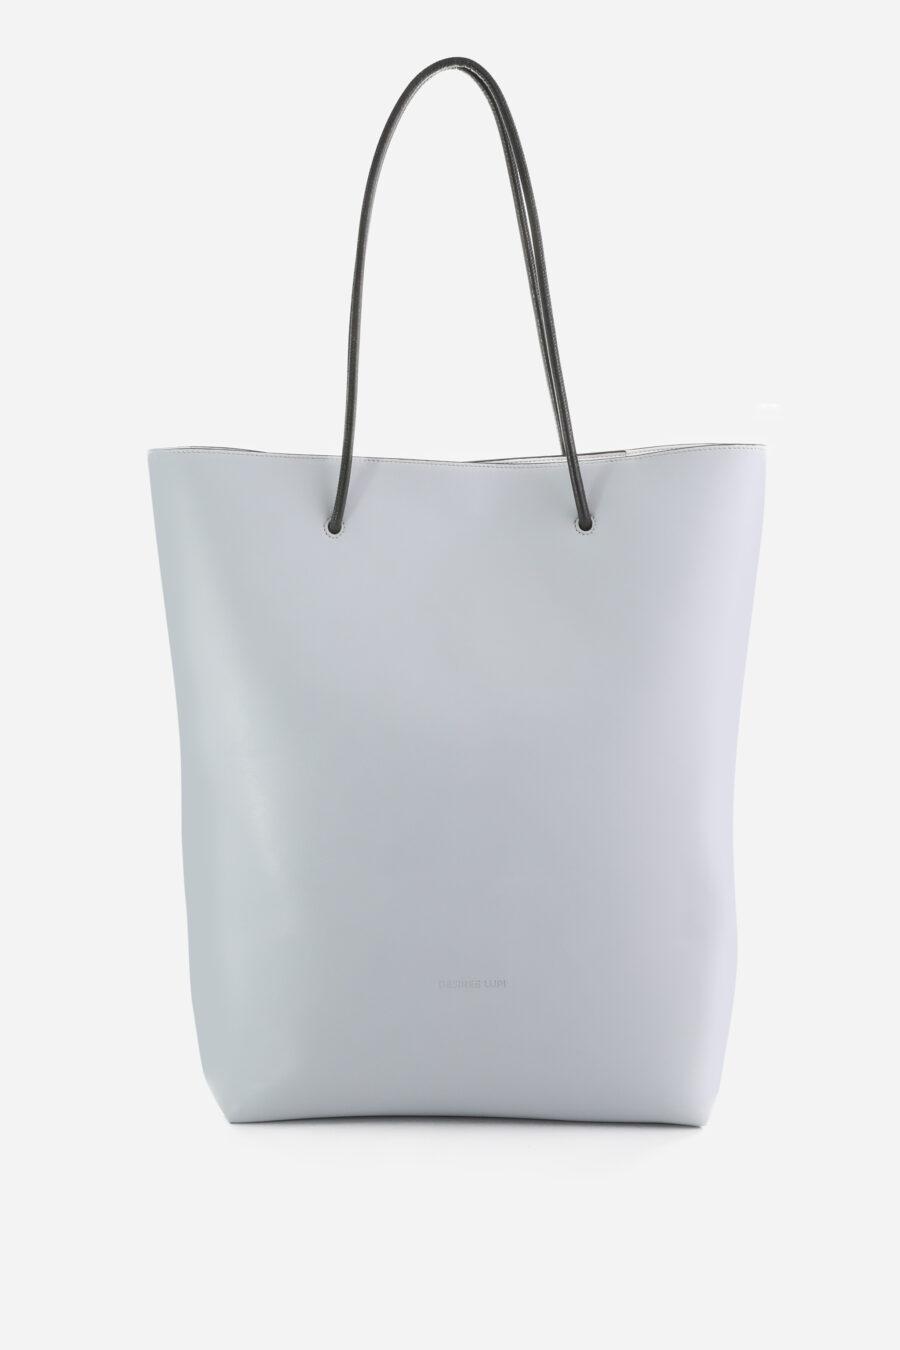 SHOPPING-BAG-KELLY-NAPPA-CELESTE_1